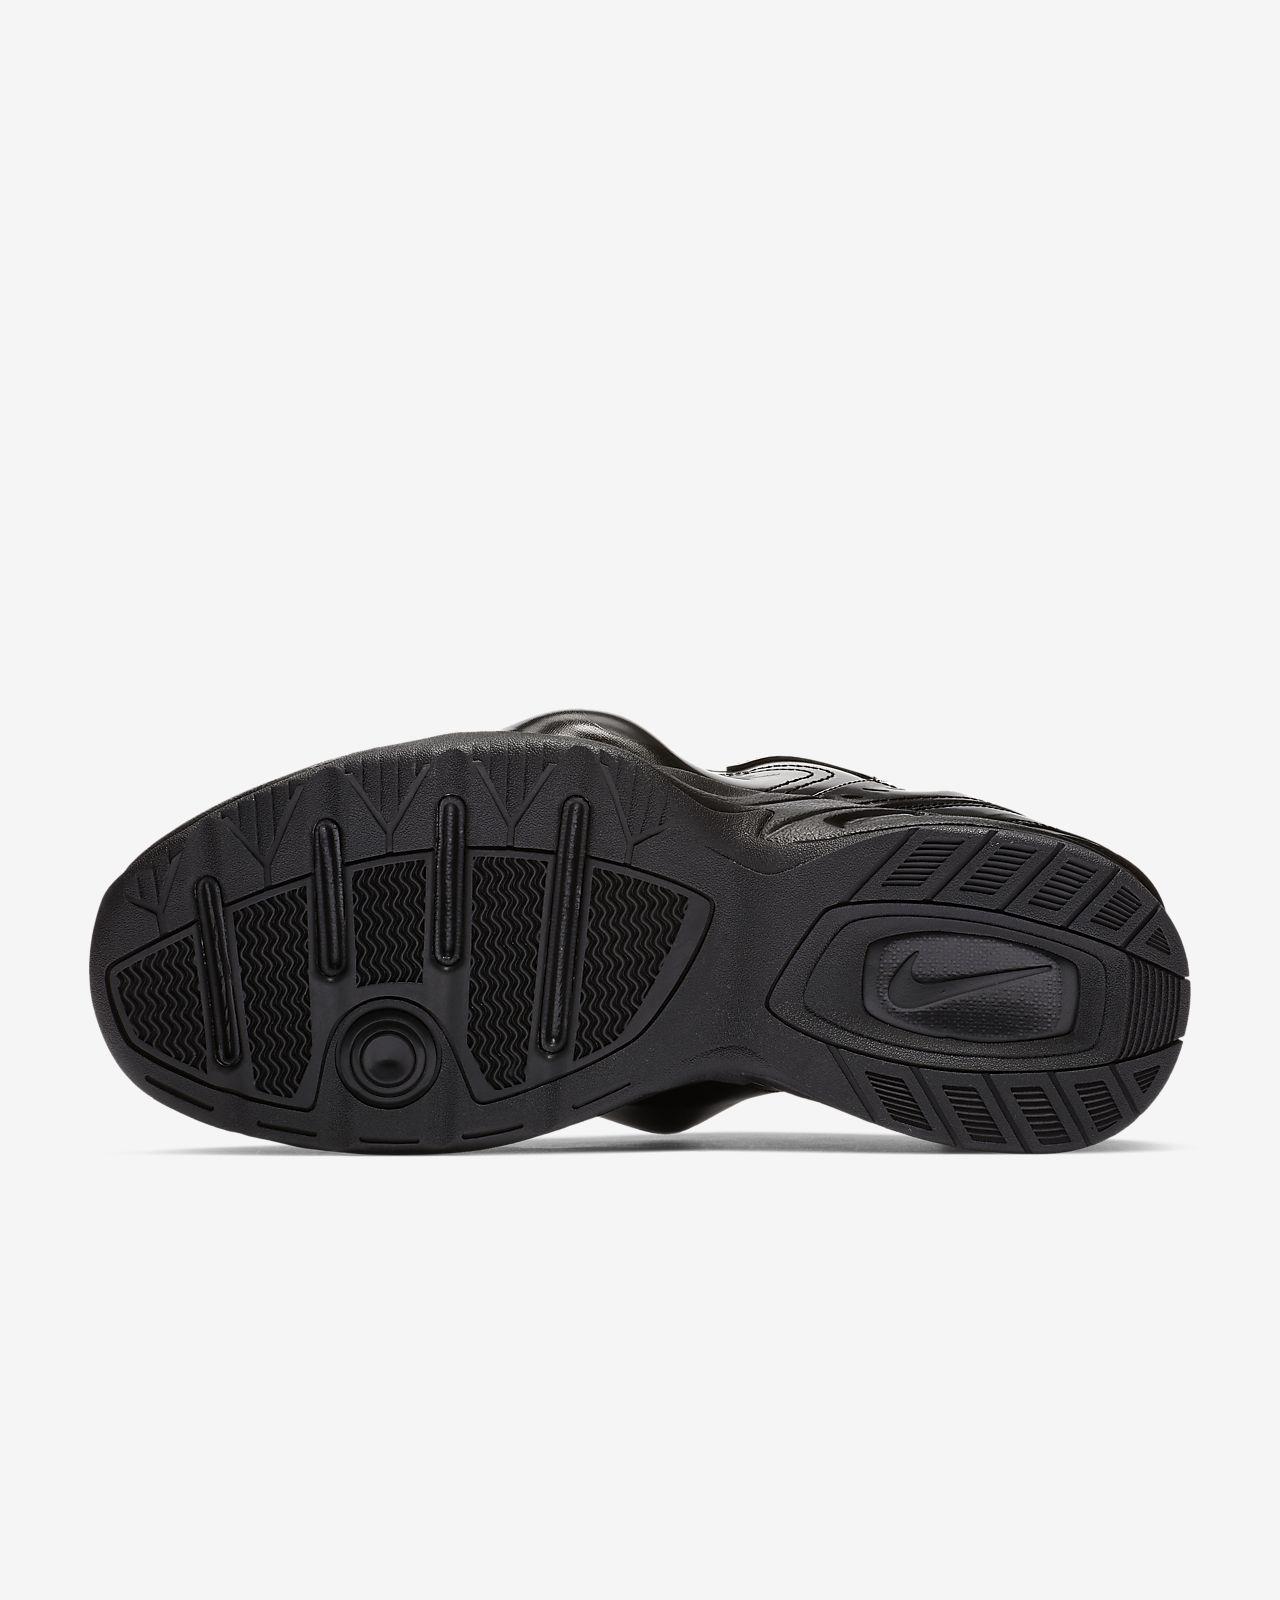 d444ef7bda19fc Nike x Martine Rose Air Monarch IV Shoe. Nike.com LU